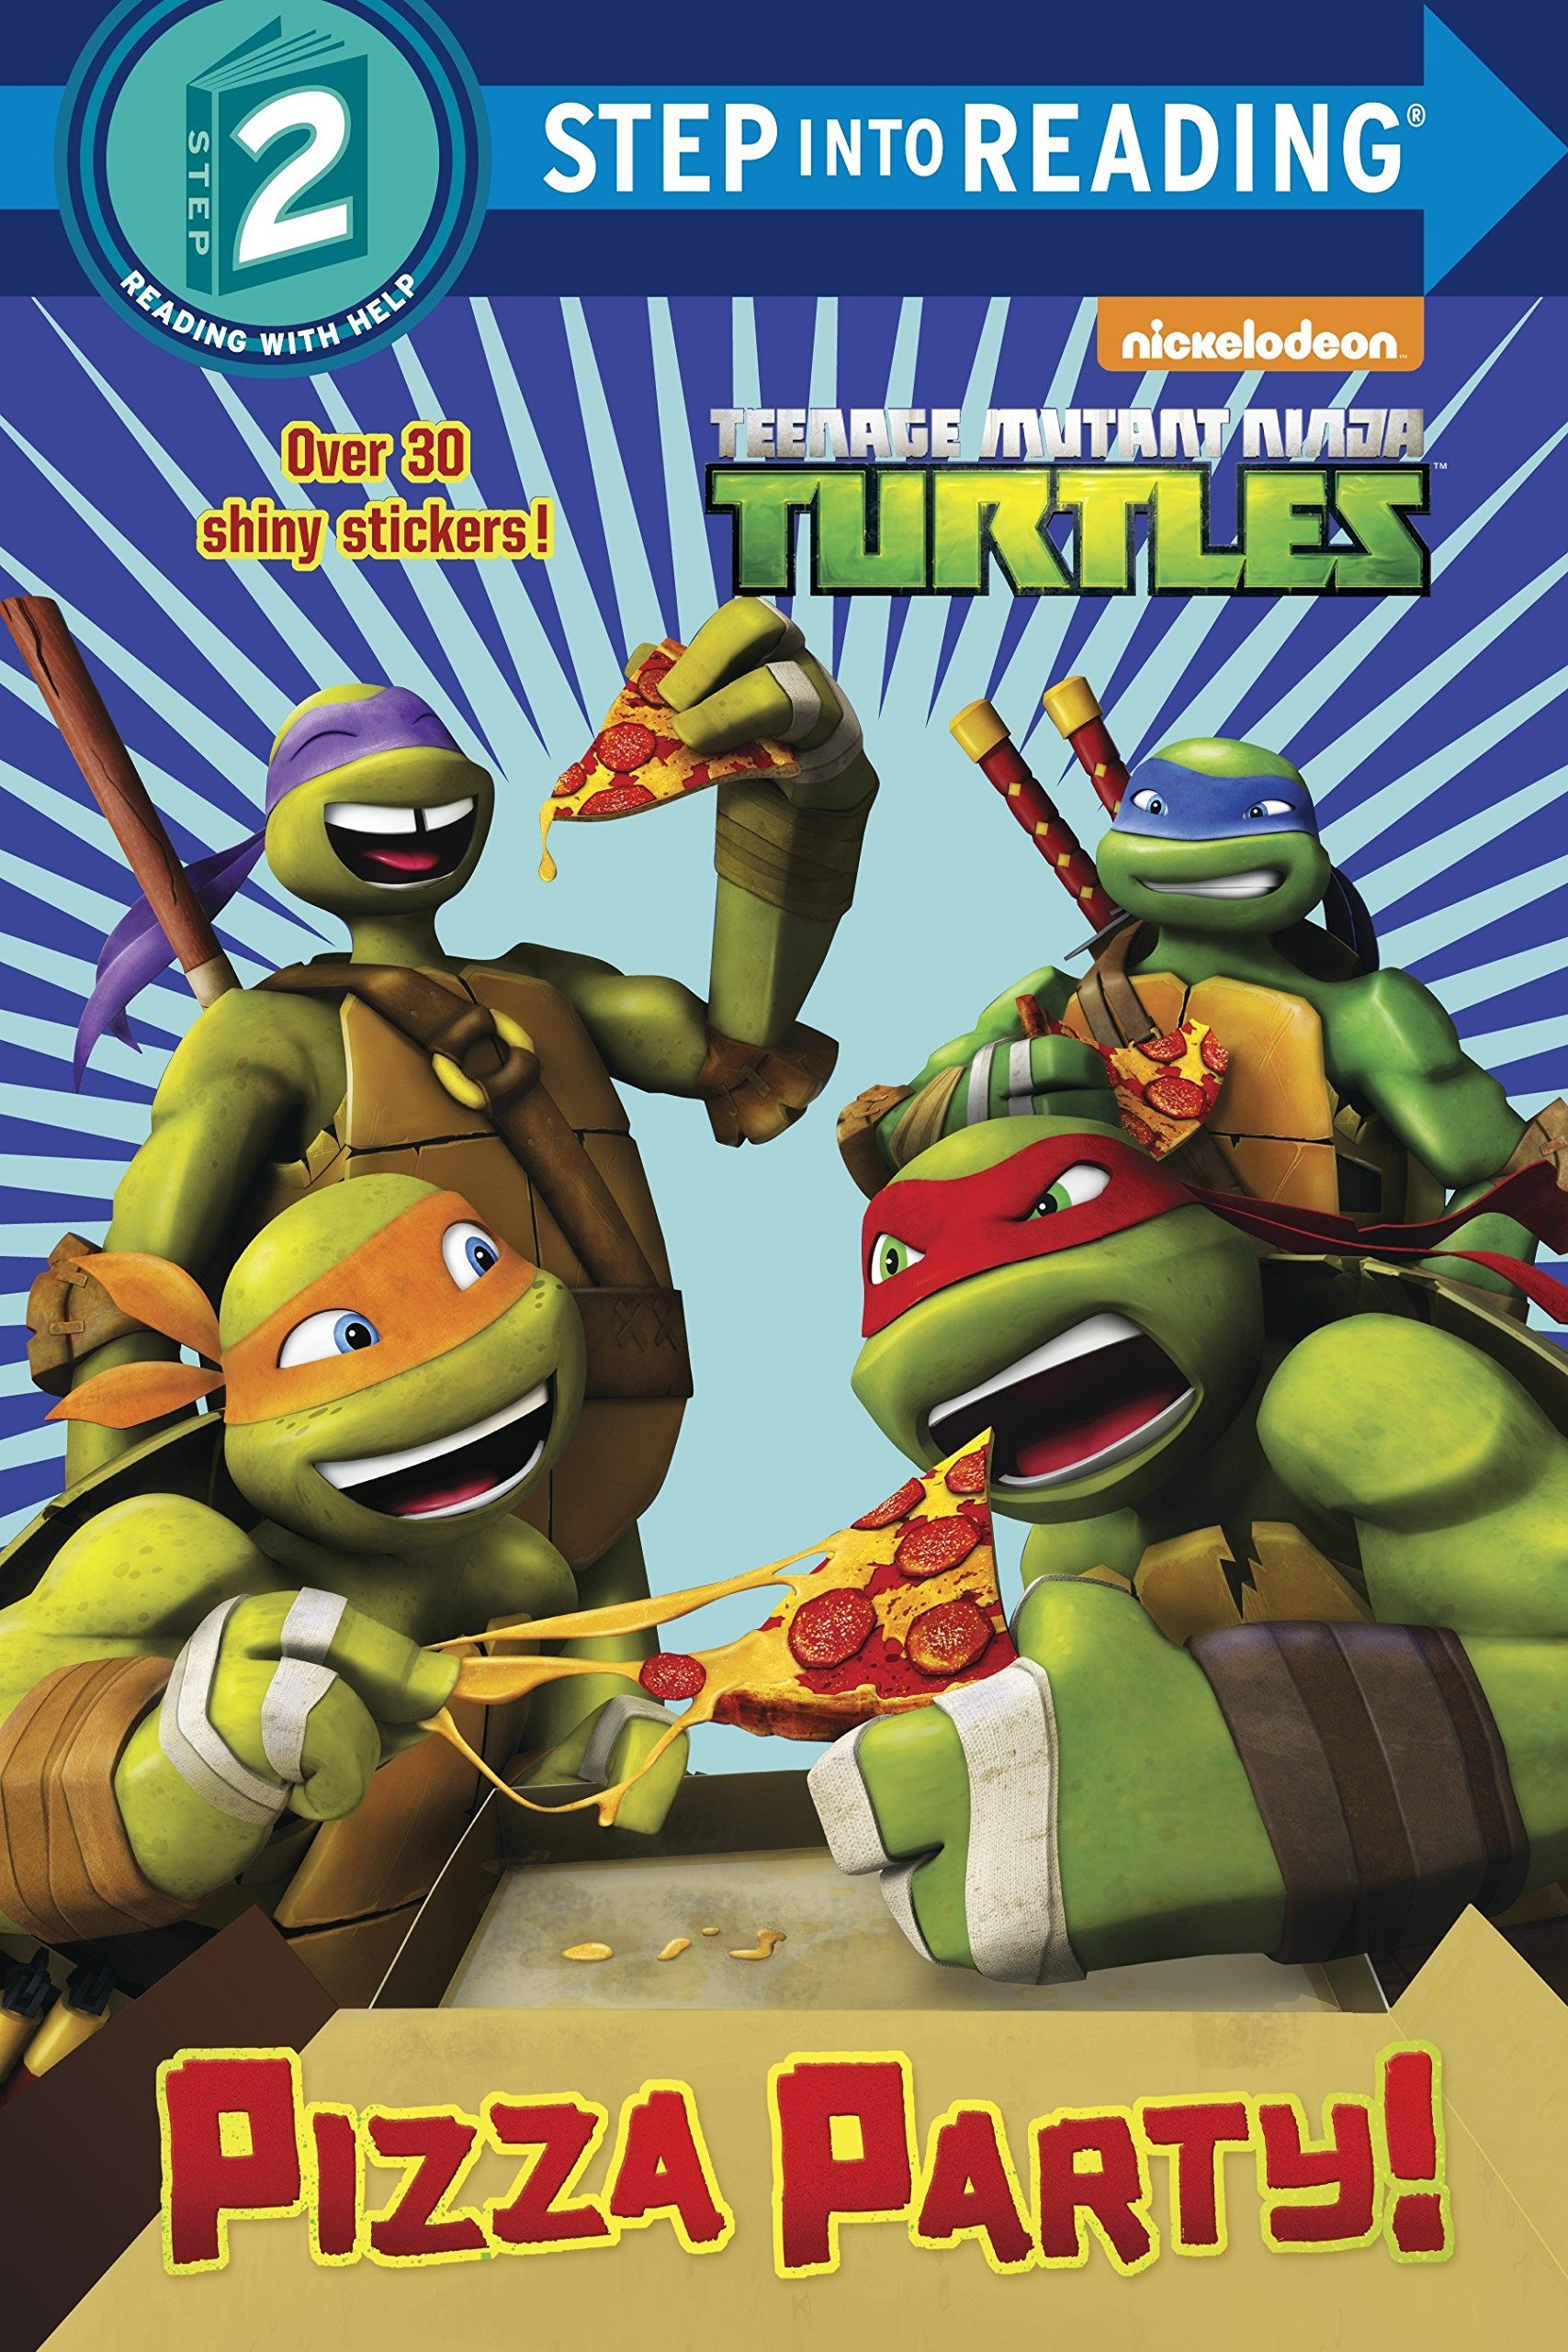 Amazon.com: Pizza Party! (Teenage Mutant Ninja Turtles ...